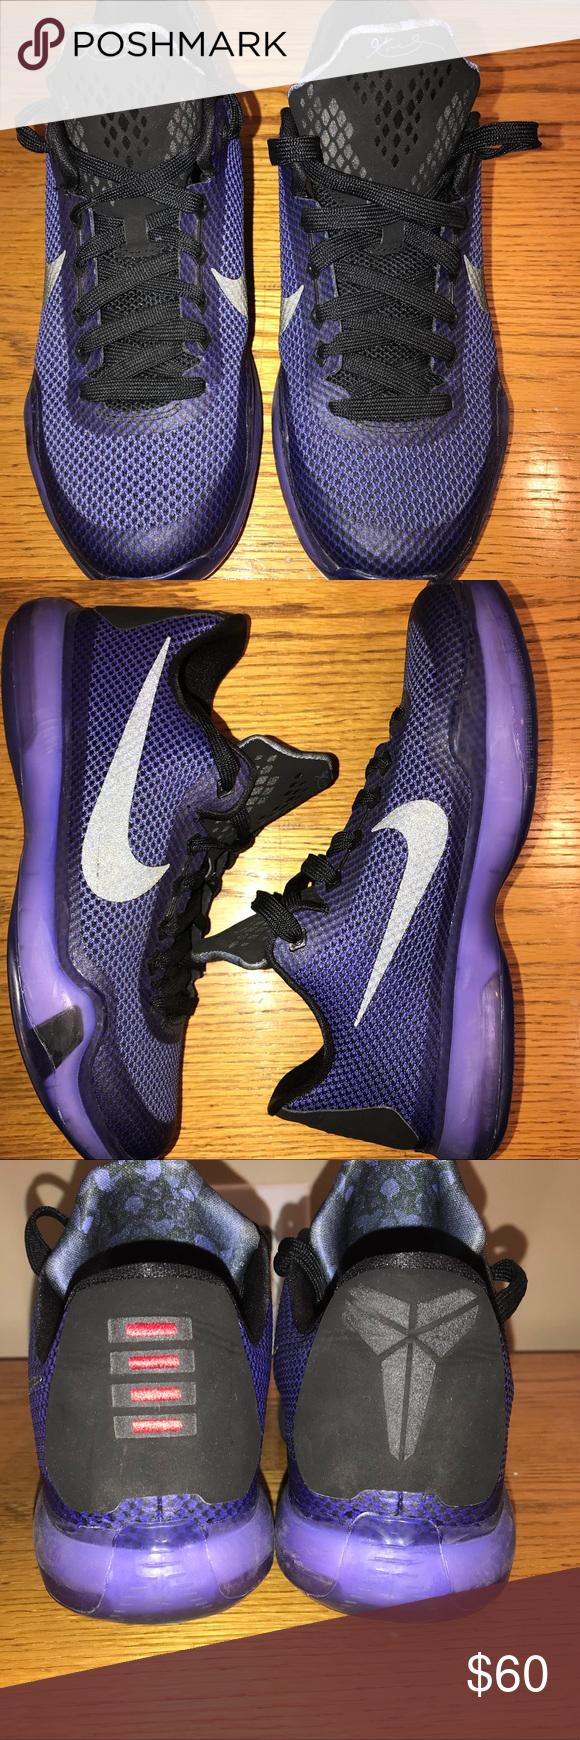 Nike Kobe 9 low size 6   Nike kobe